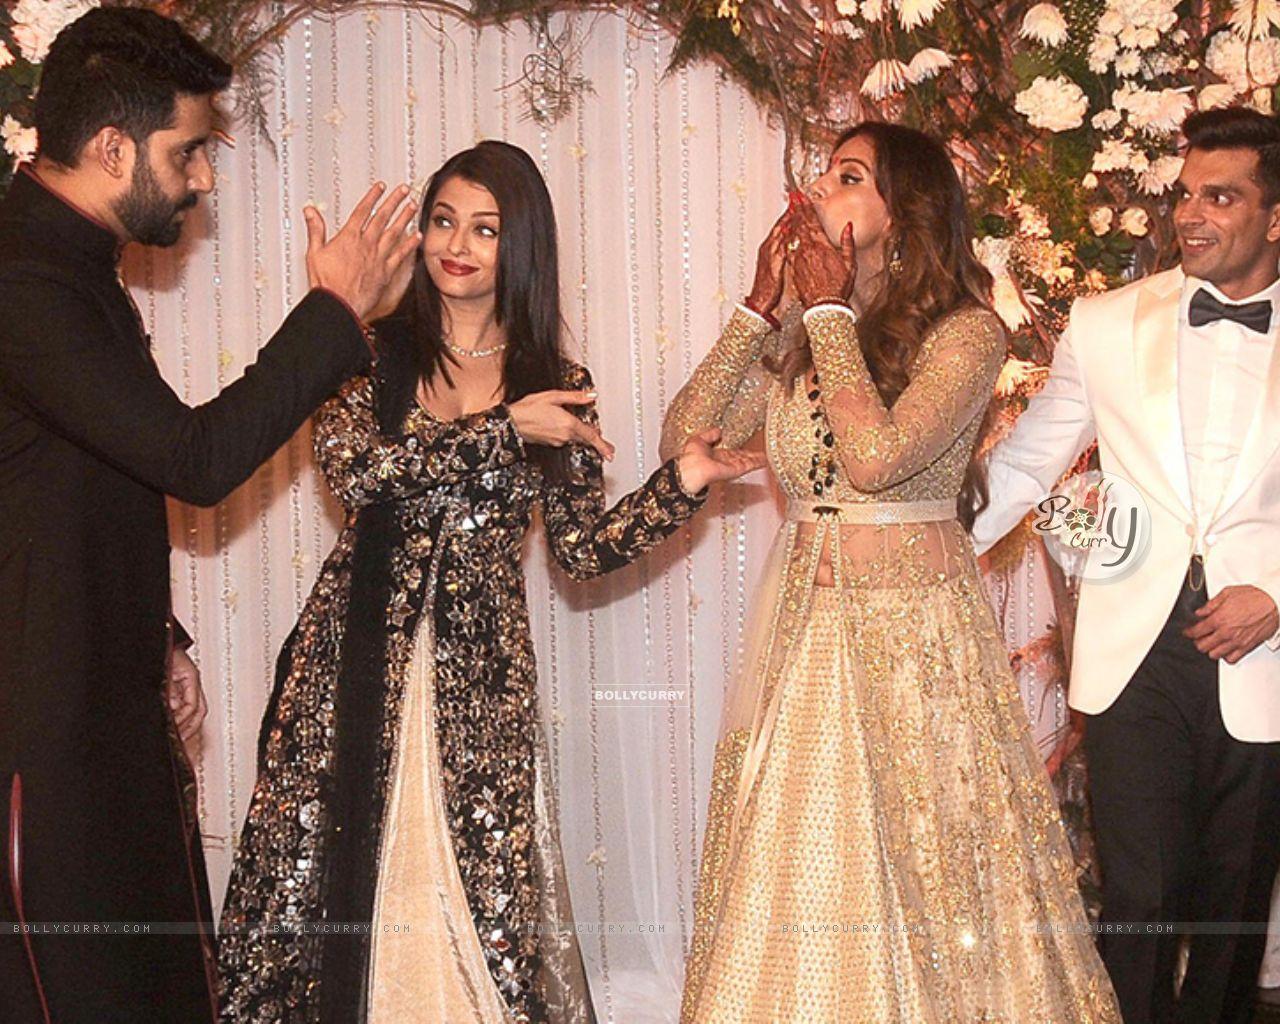 Abhishek Bachchan, Aishwarya Rai, Bipasha Basu and Karan Singh Grover (436766) size:1280x1024